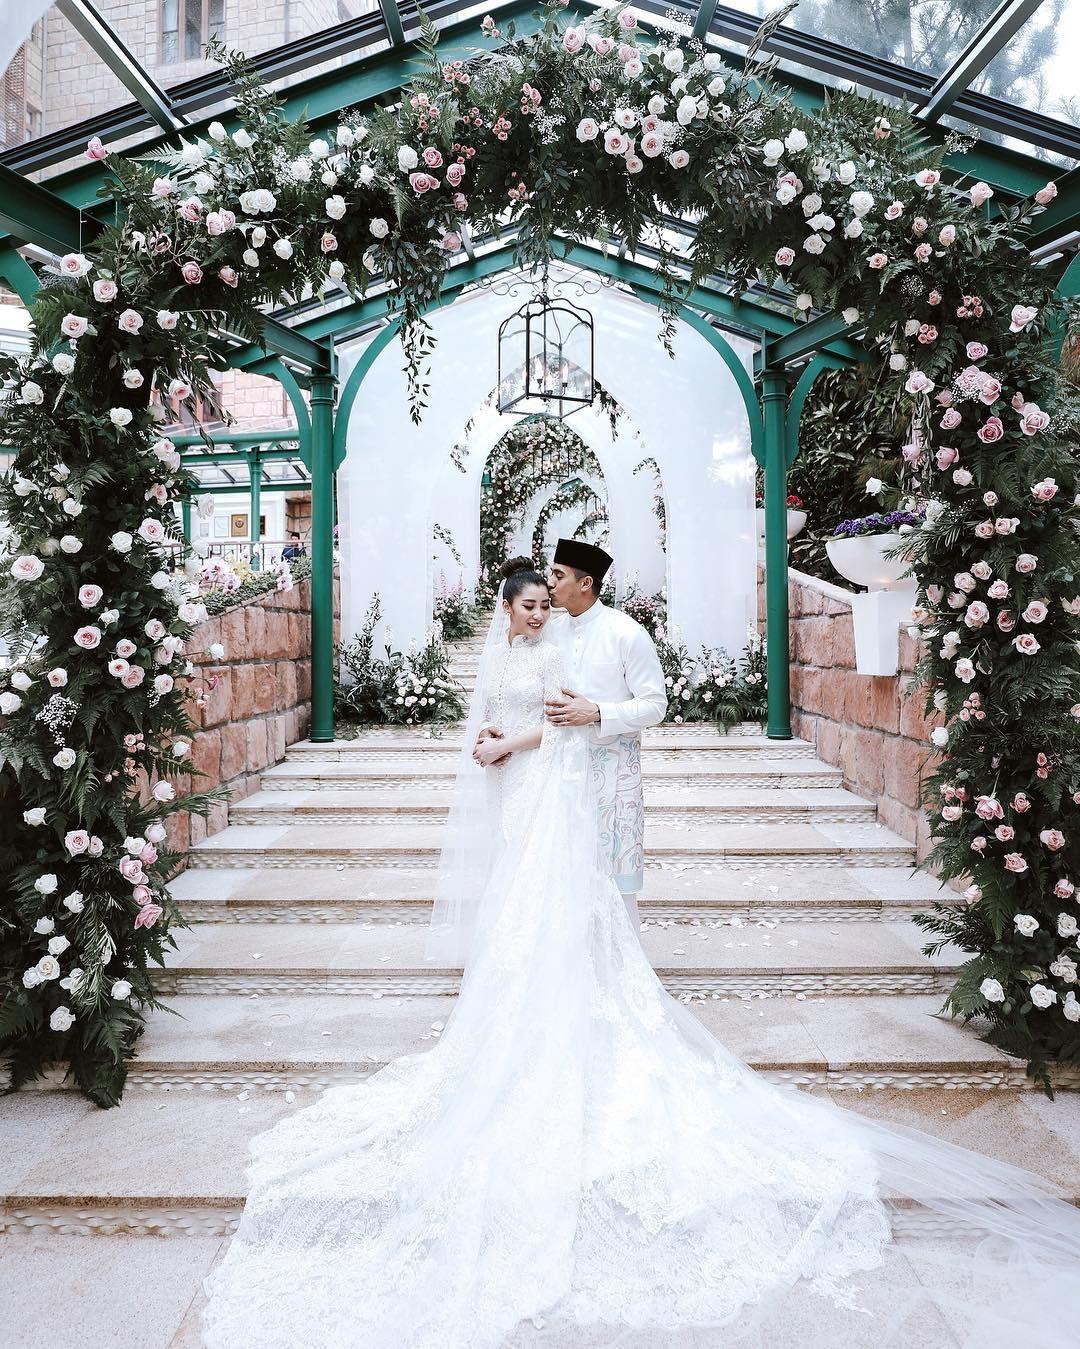 Tatlergrams Of The Week: Inside The Fairy-Tale Wedding Of Faliq ...